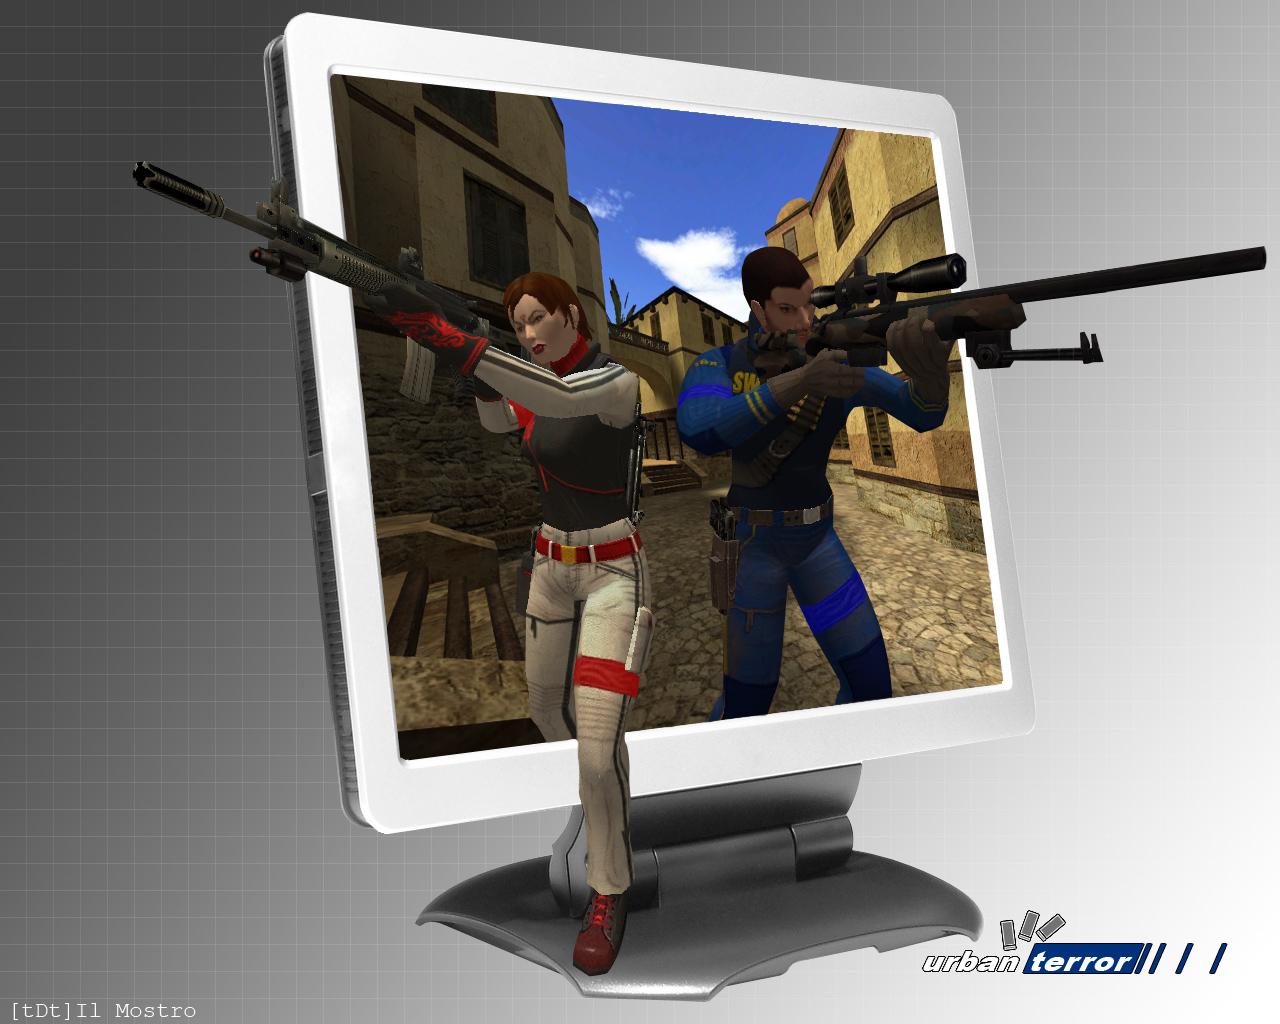 http://oscartux.files.wordpress.com/2010/10/urt_meets_reality_2.jpg